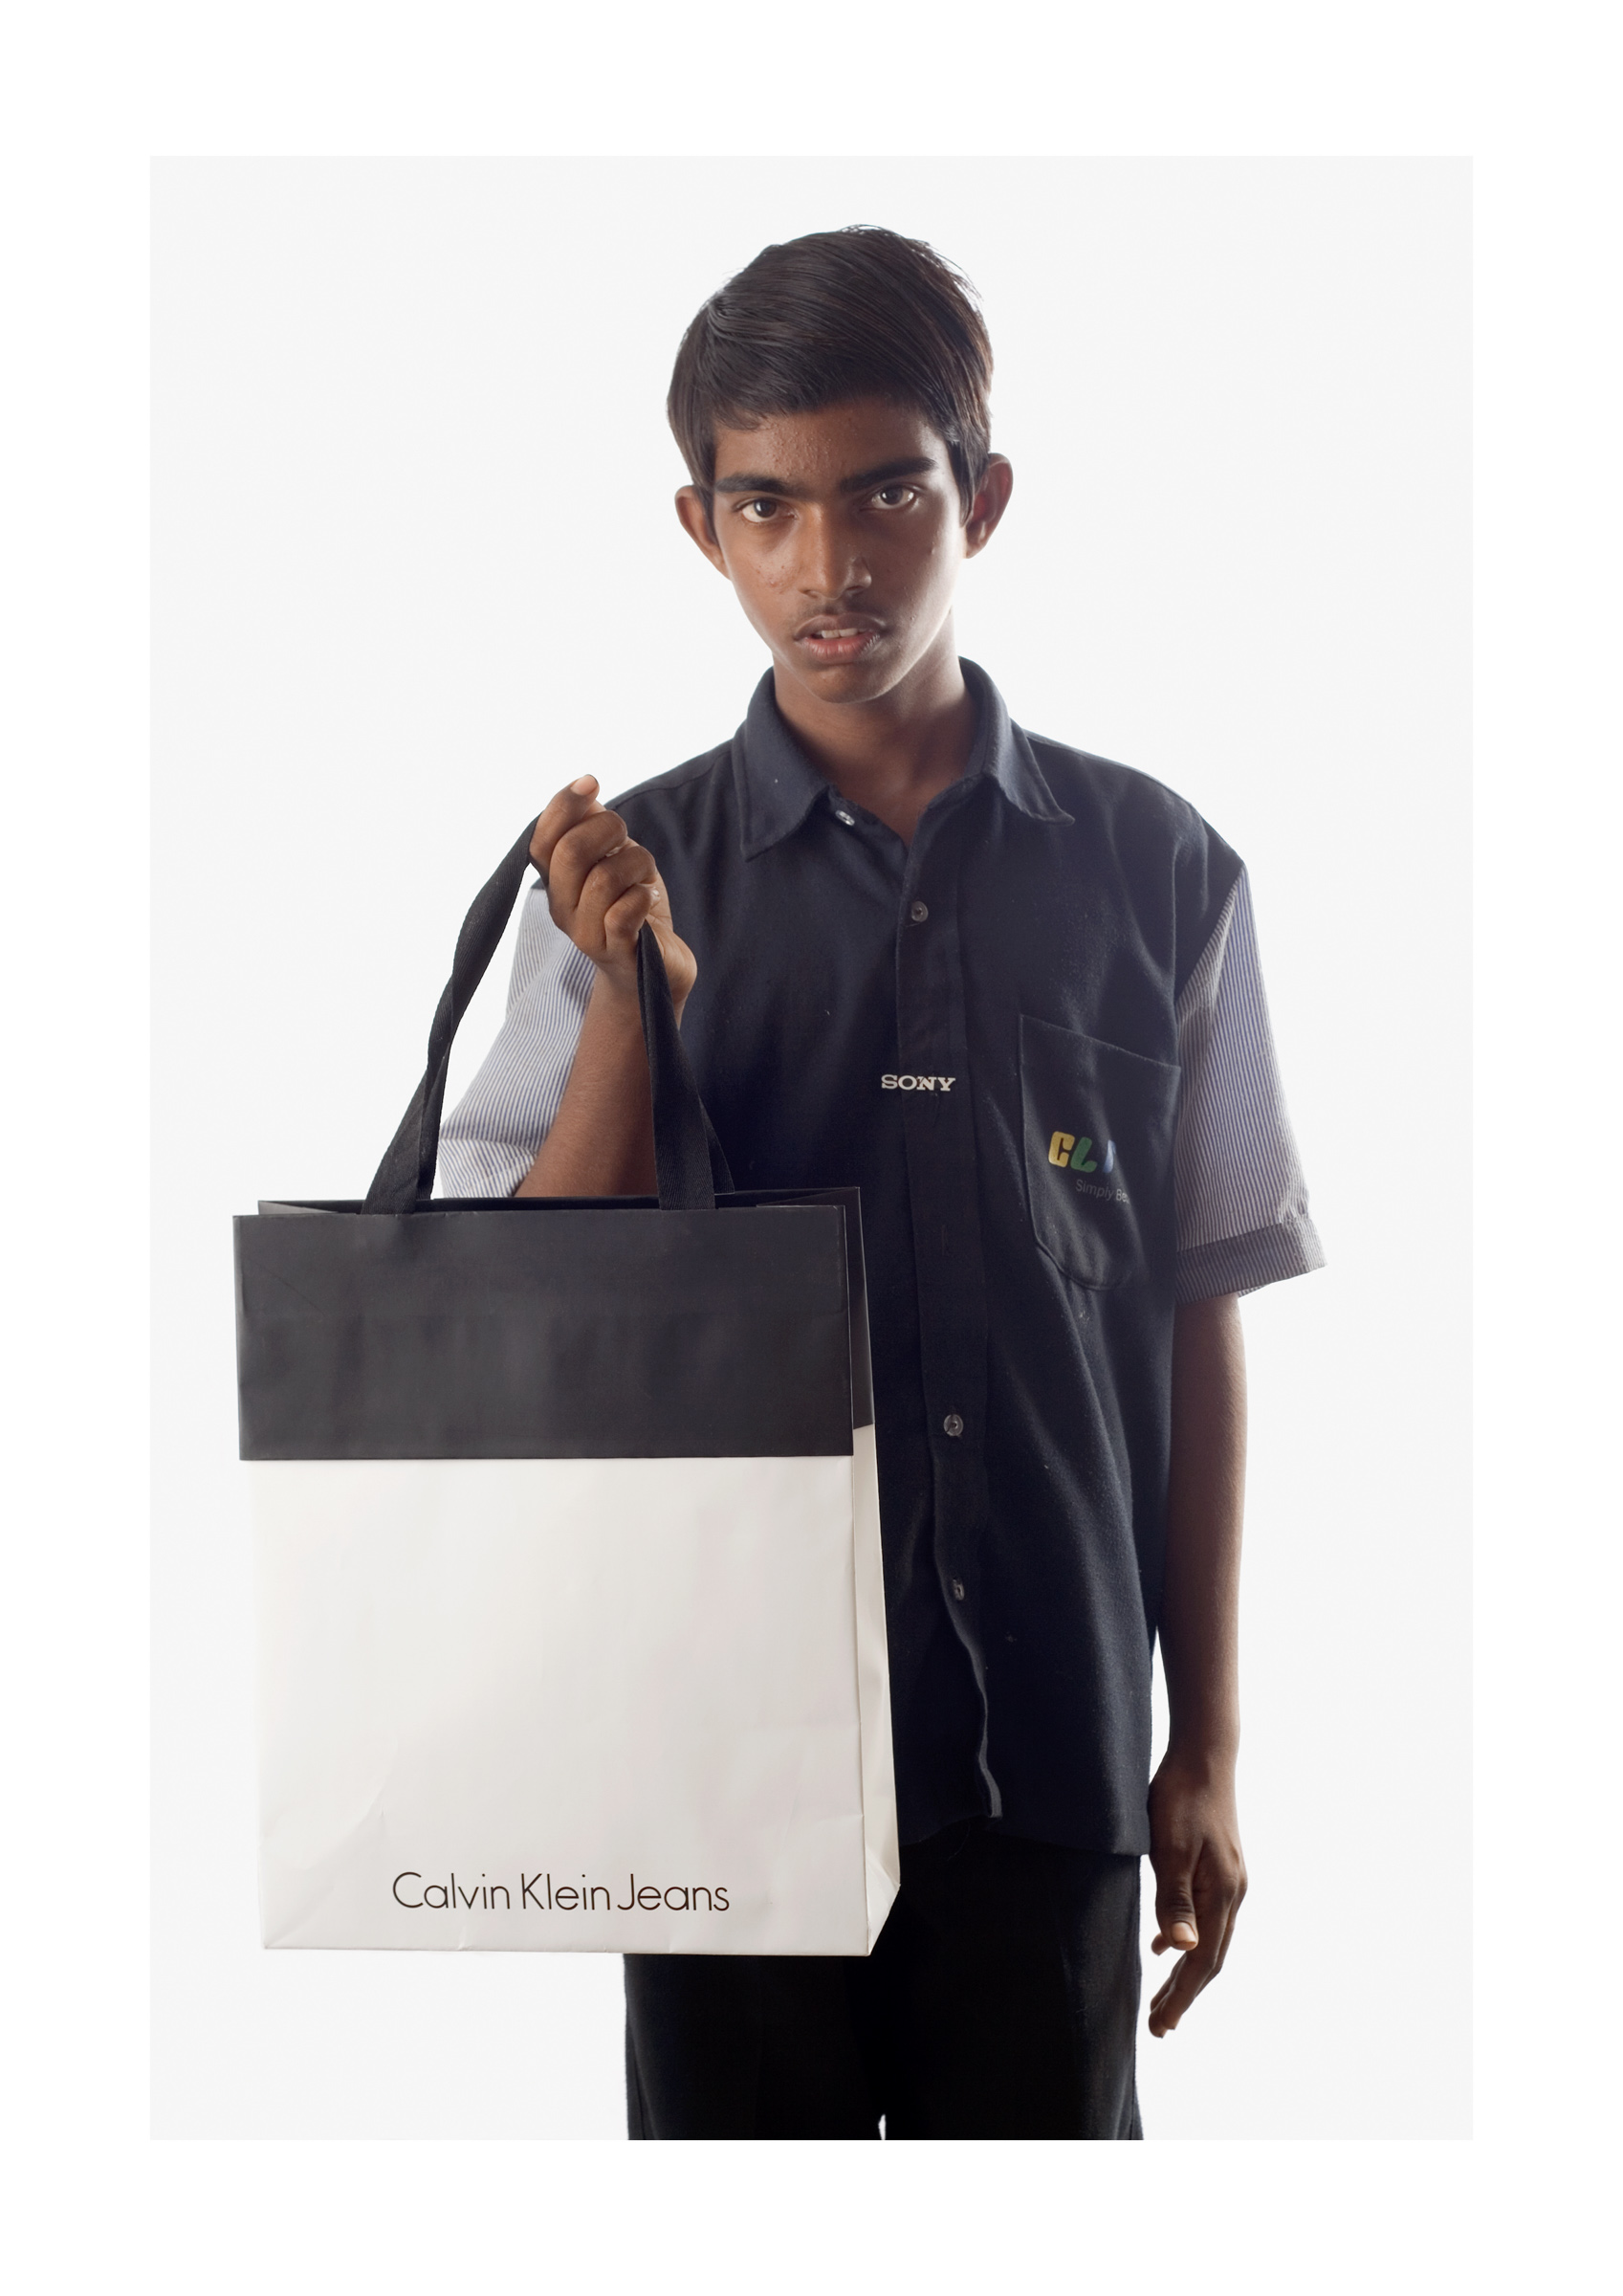 Kriator_Photographer_MindtheGap_Calvin Klein Jeans 1.jpg